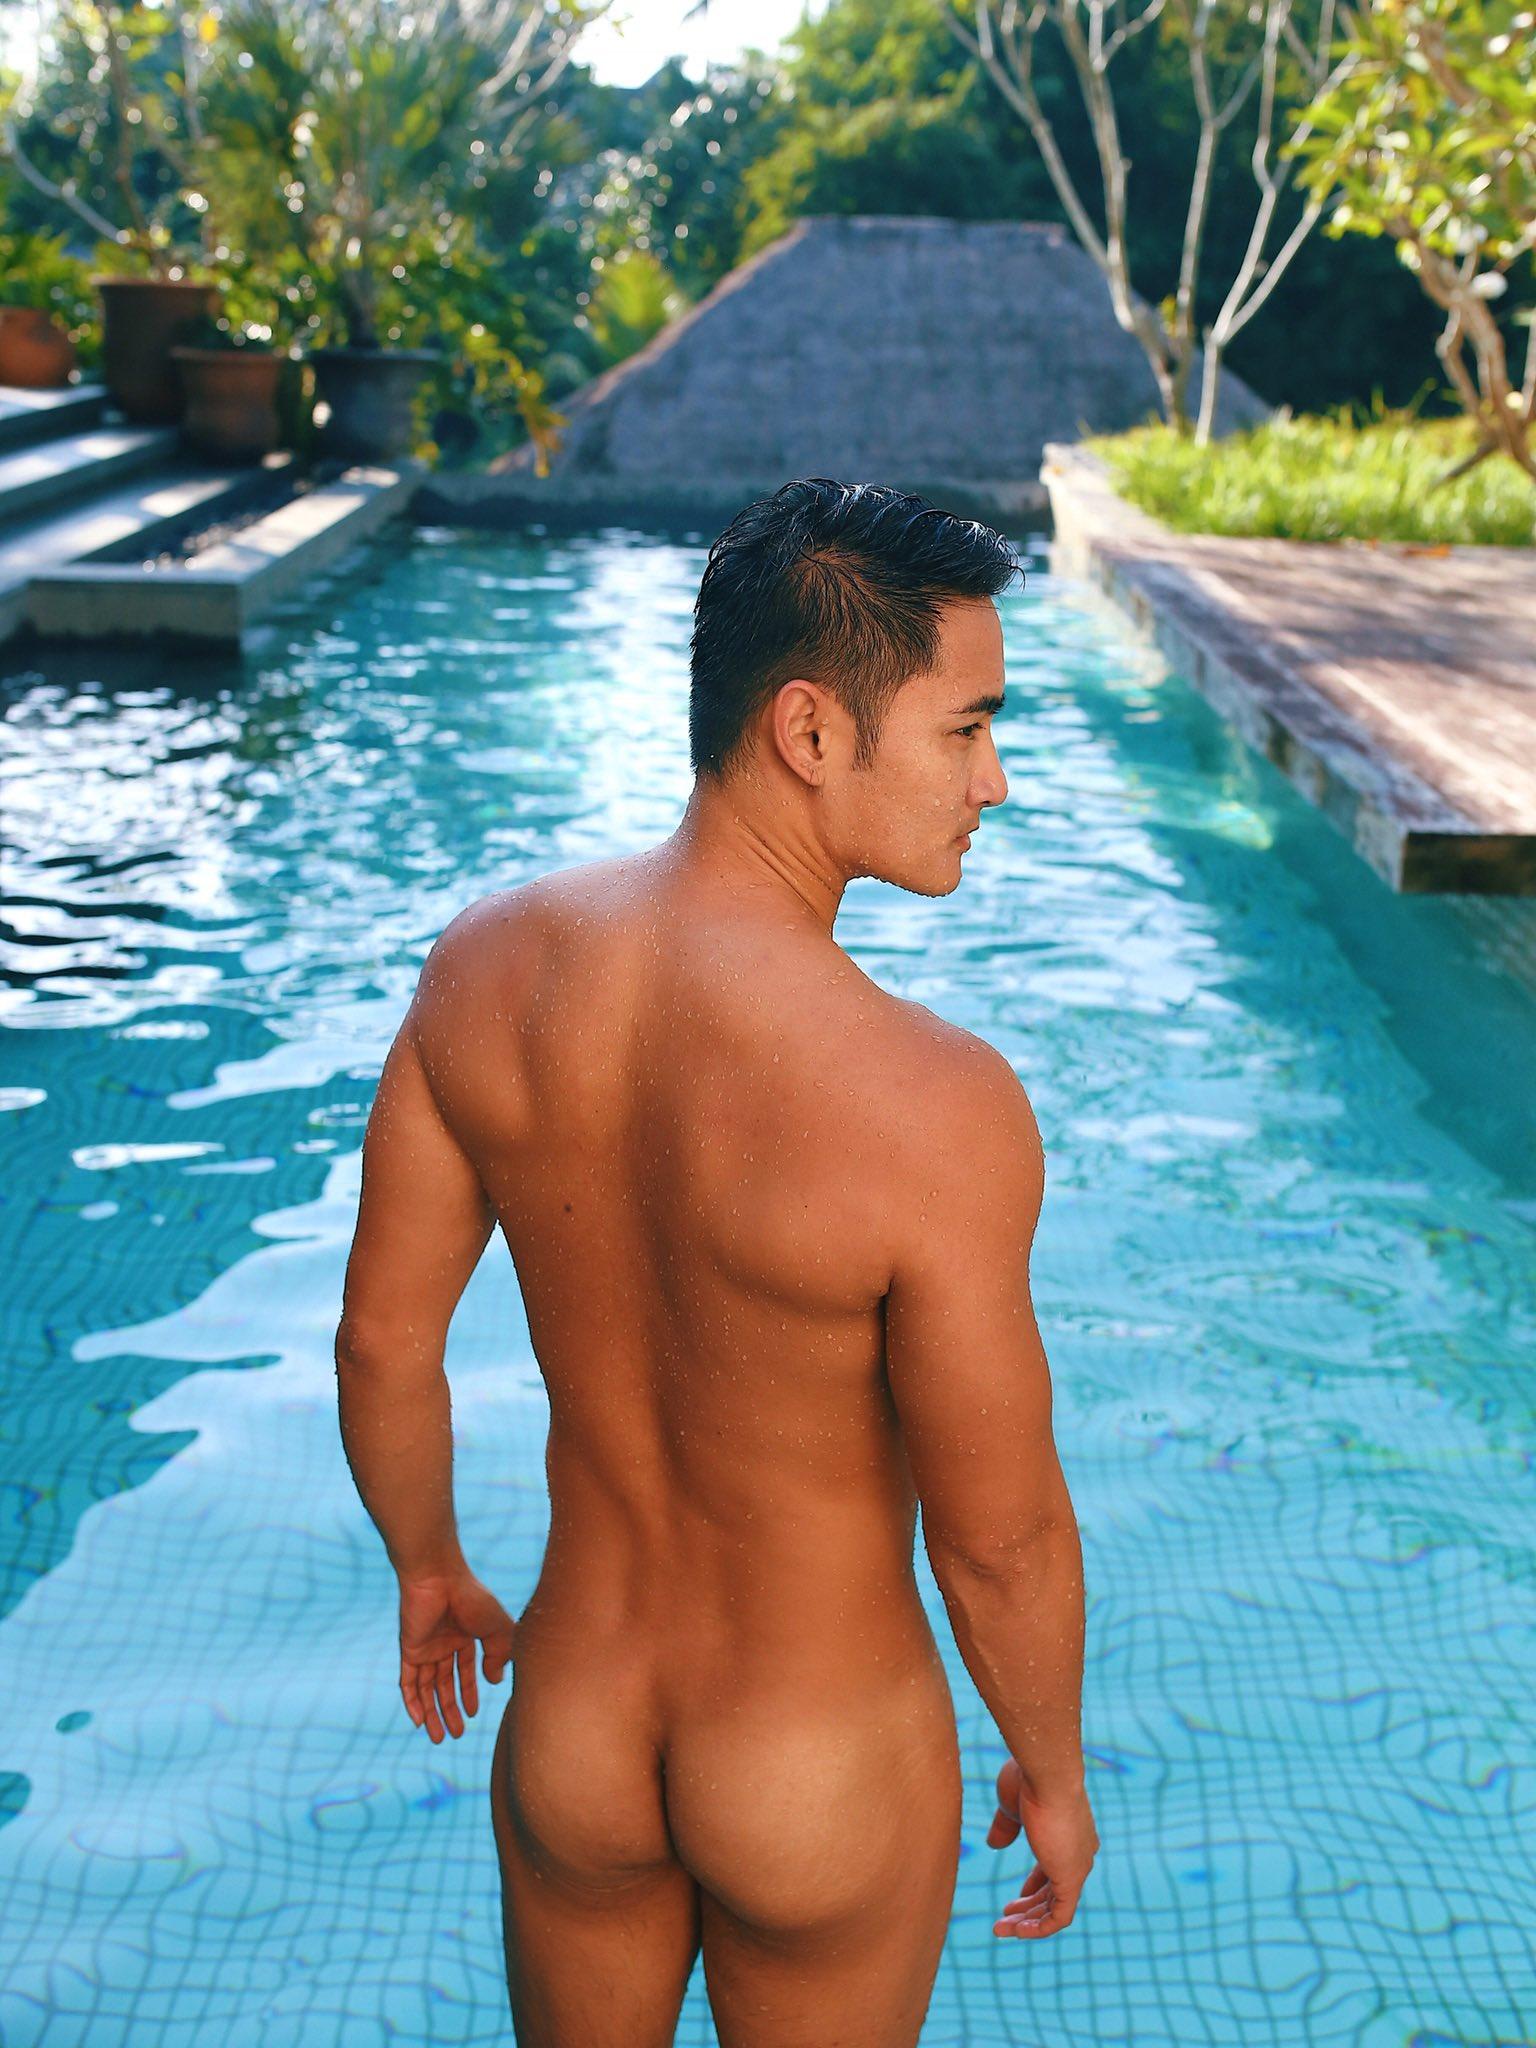 2011 - 2012 | Manhunt - Mister International - Mister Universe Model | Hawaii - USA | Rhonee Rojas - Page 35 EMYABtuUUAAT1nt?format=jpg&name=4096x4096